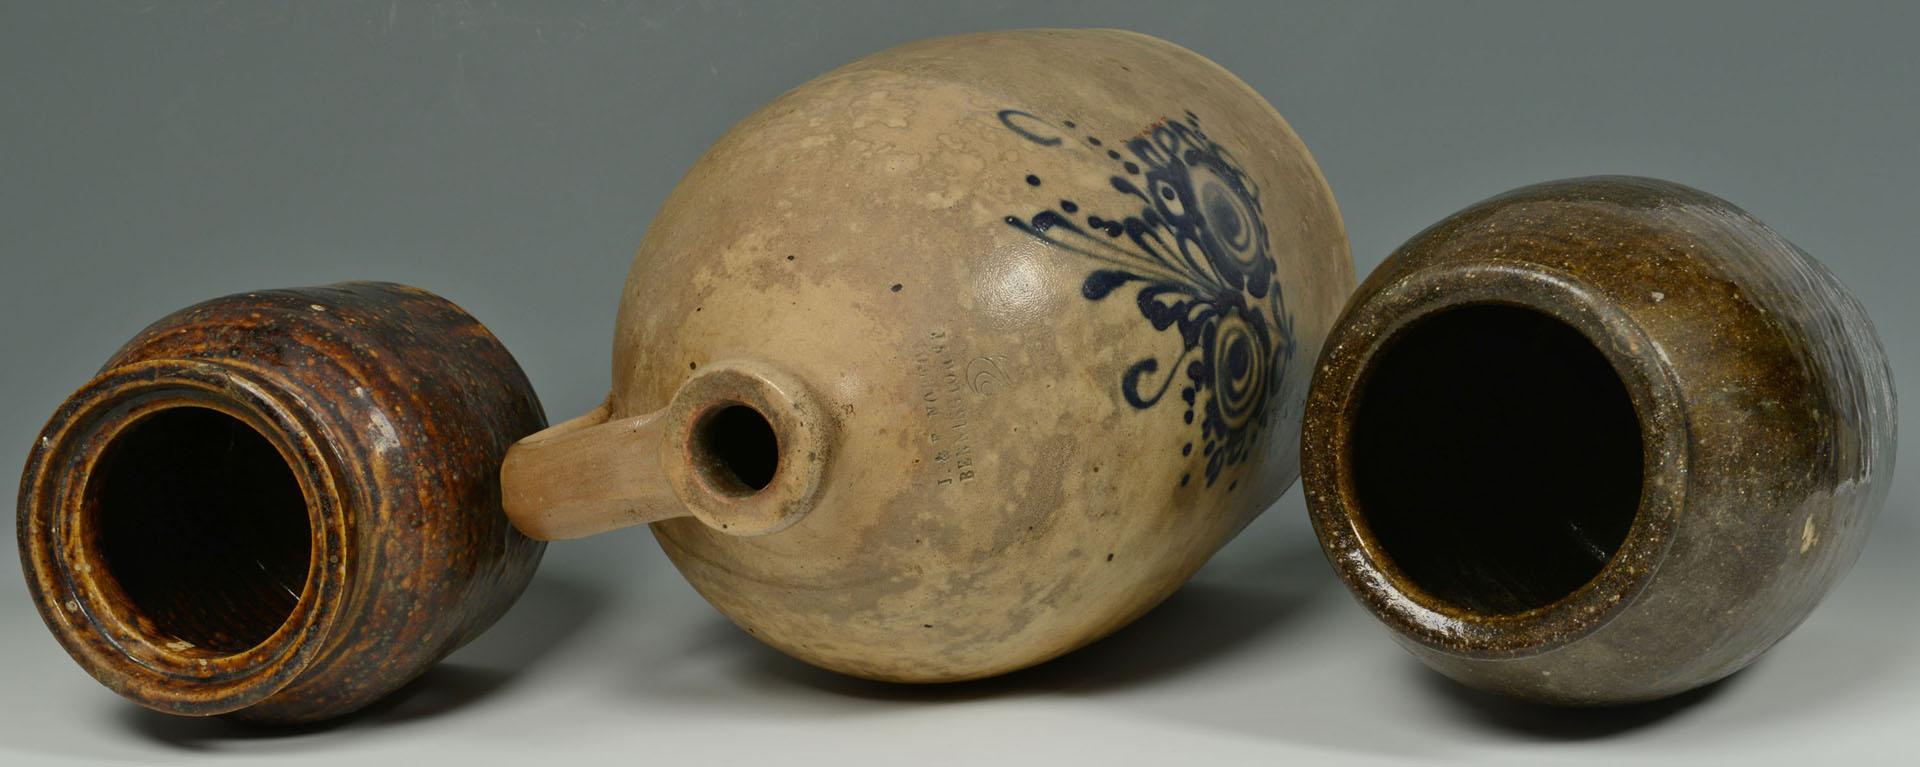 Lot 455: 3 Pieces of Stoneware inc. Alkaline